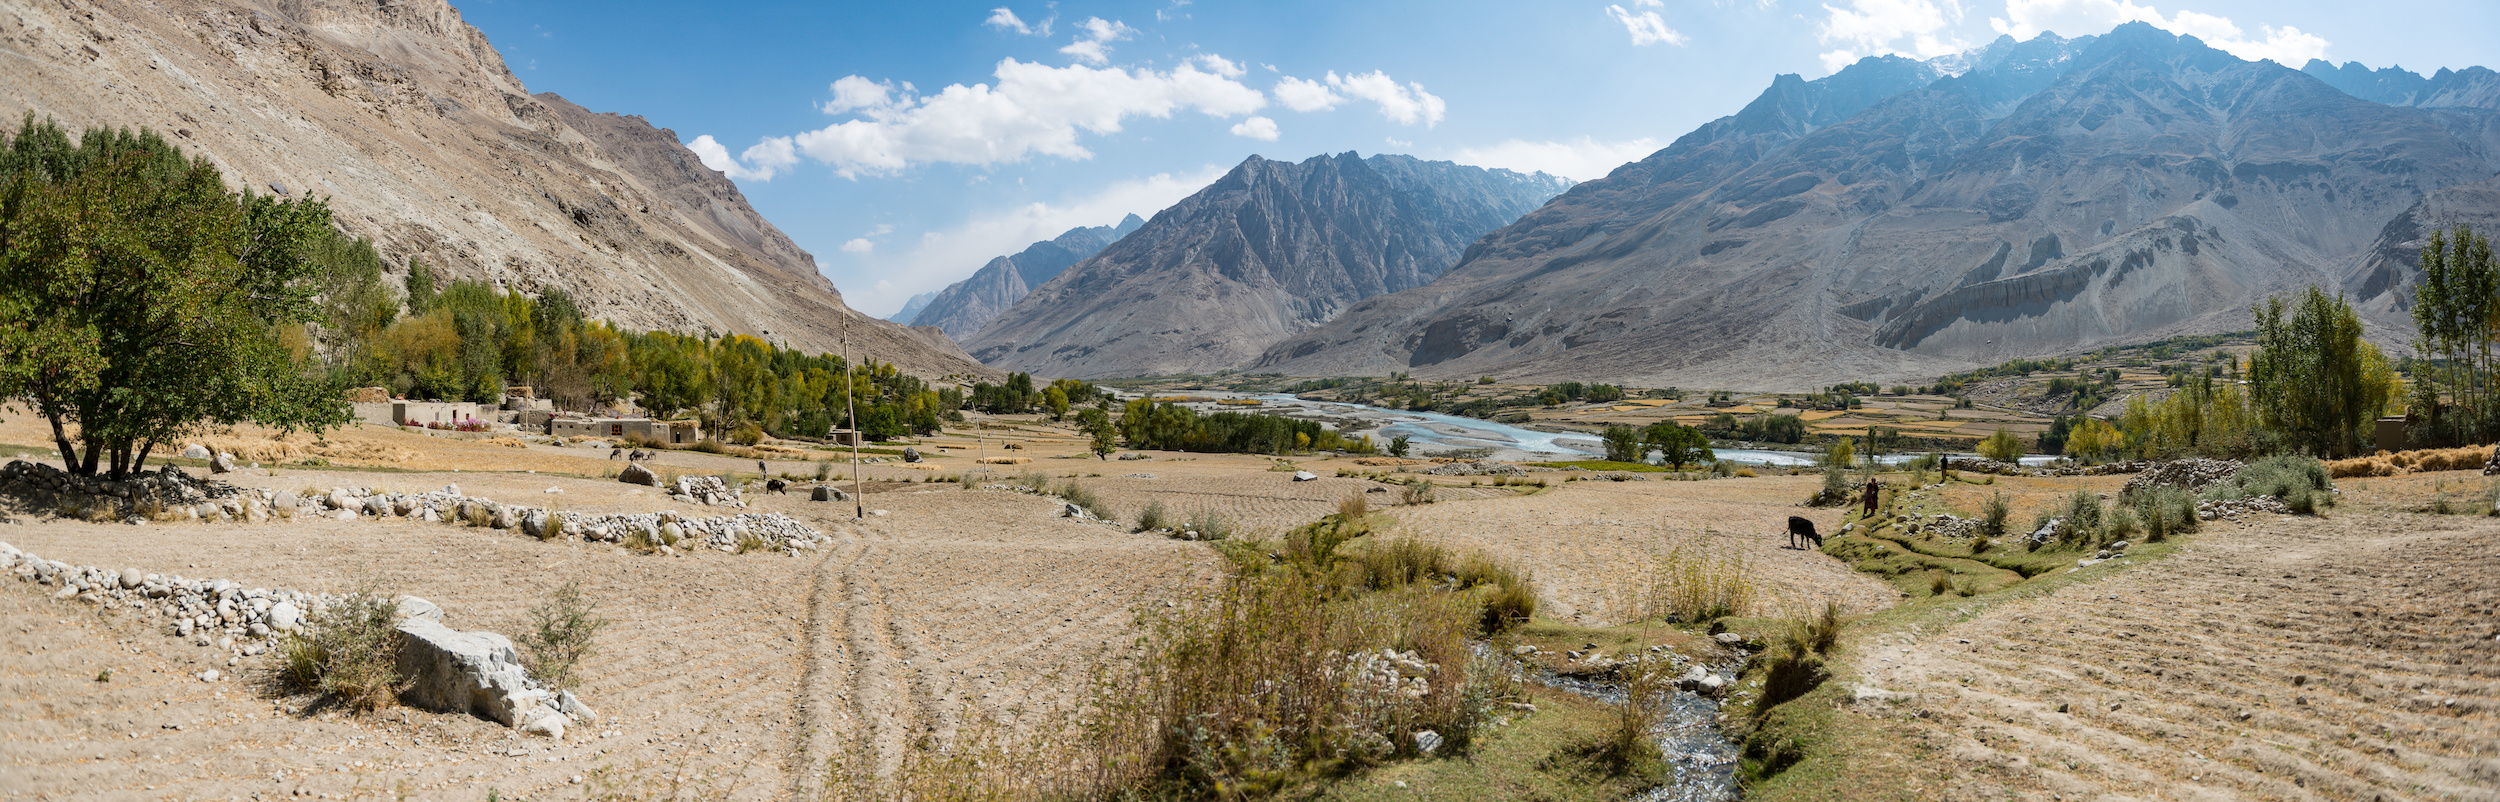 Wakhan Corridor, Afghanistan